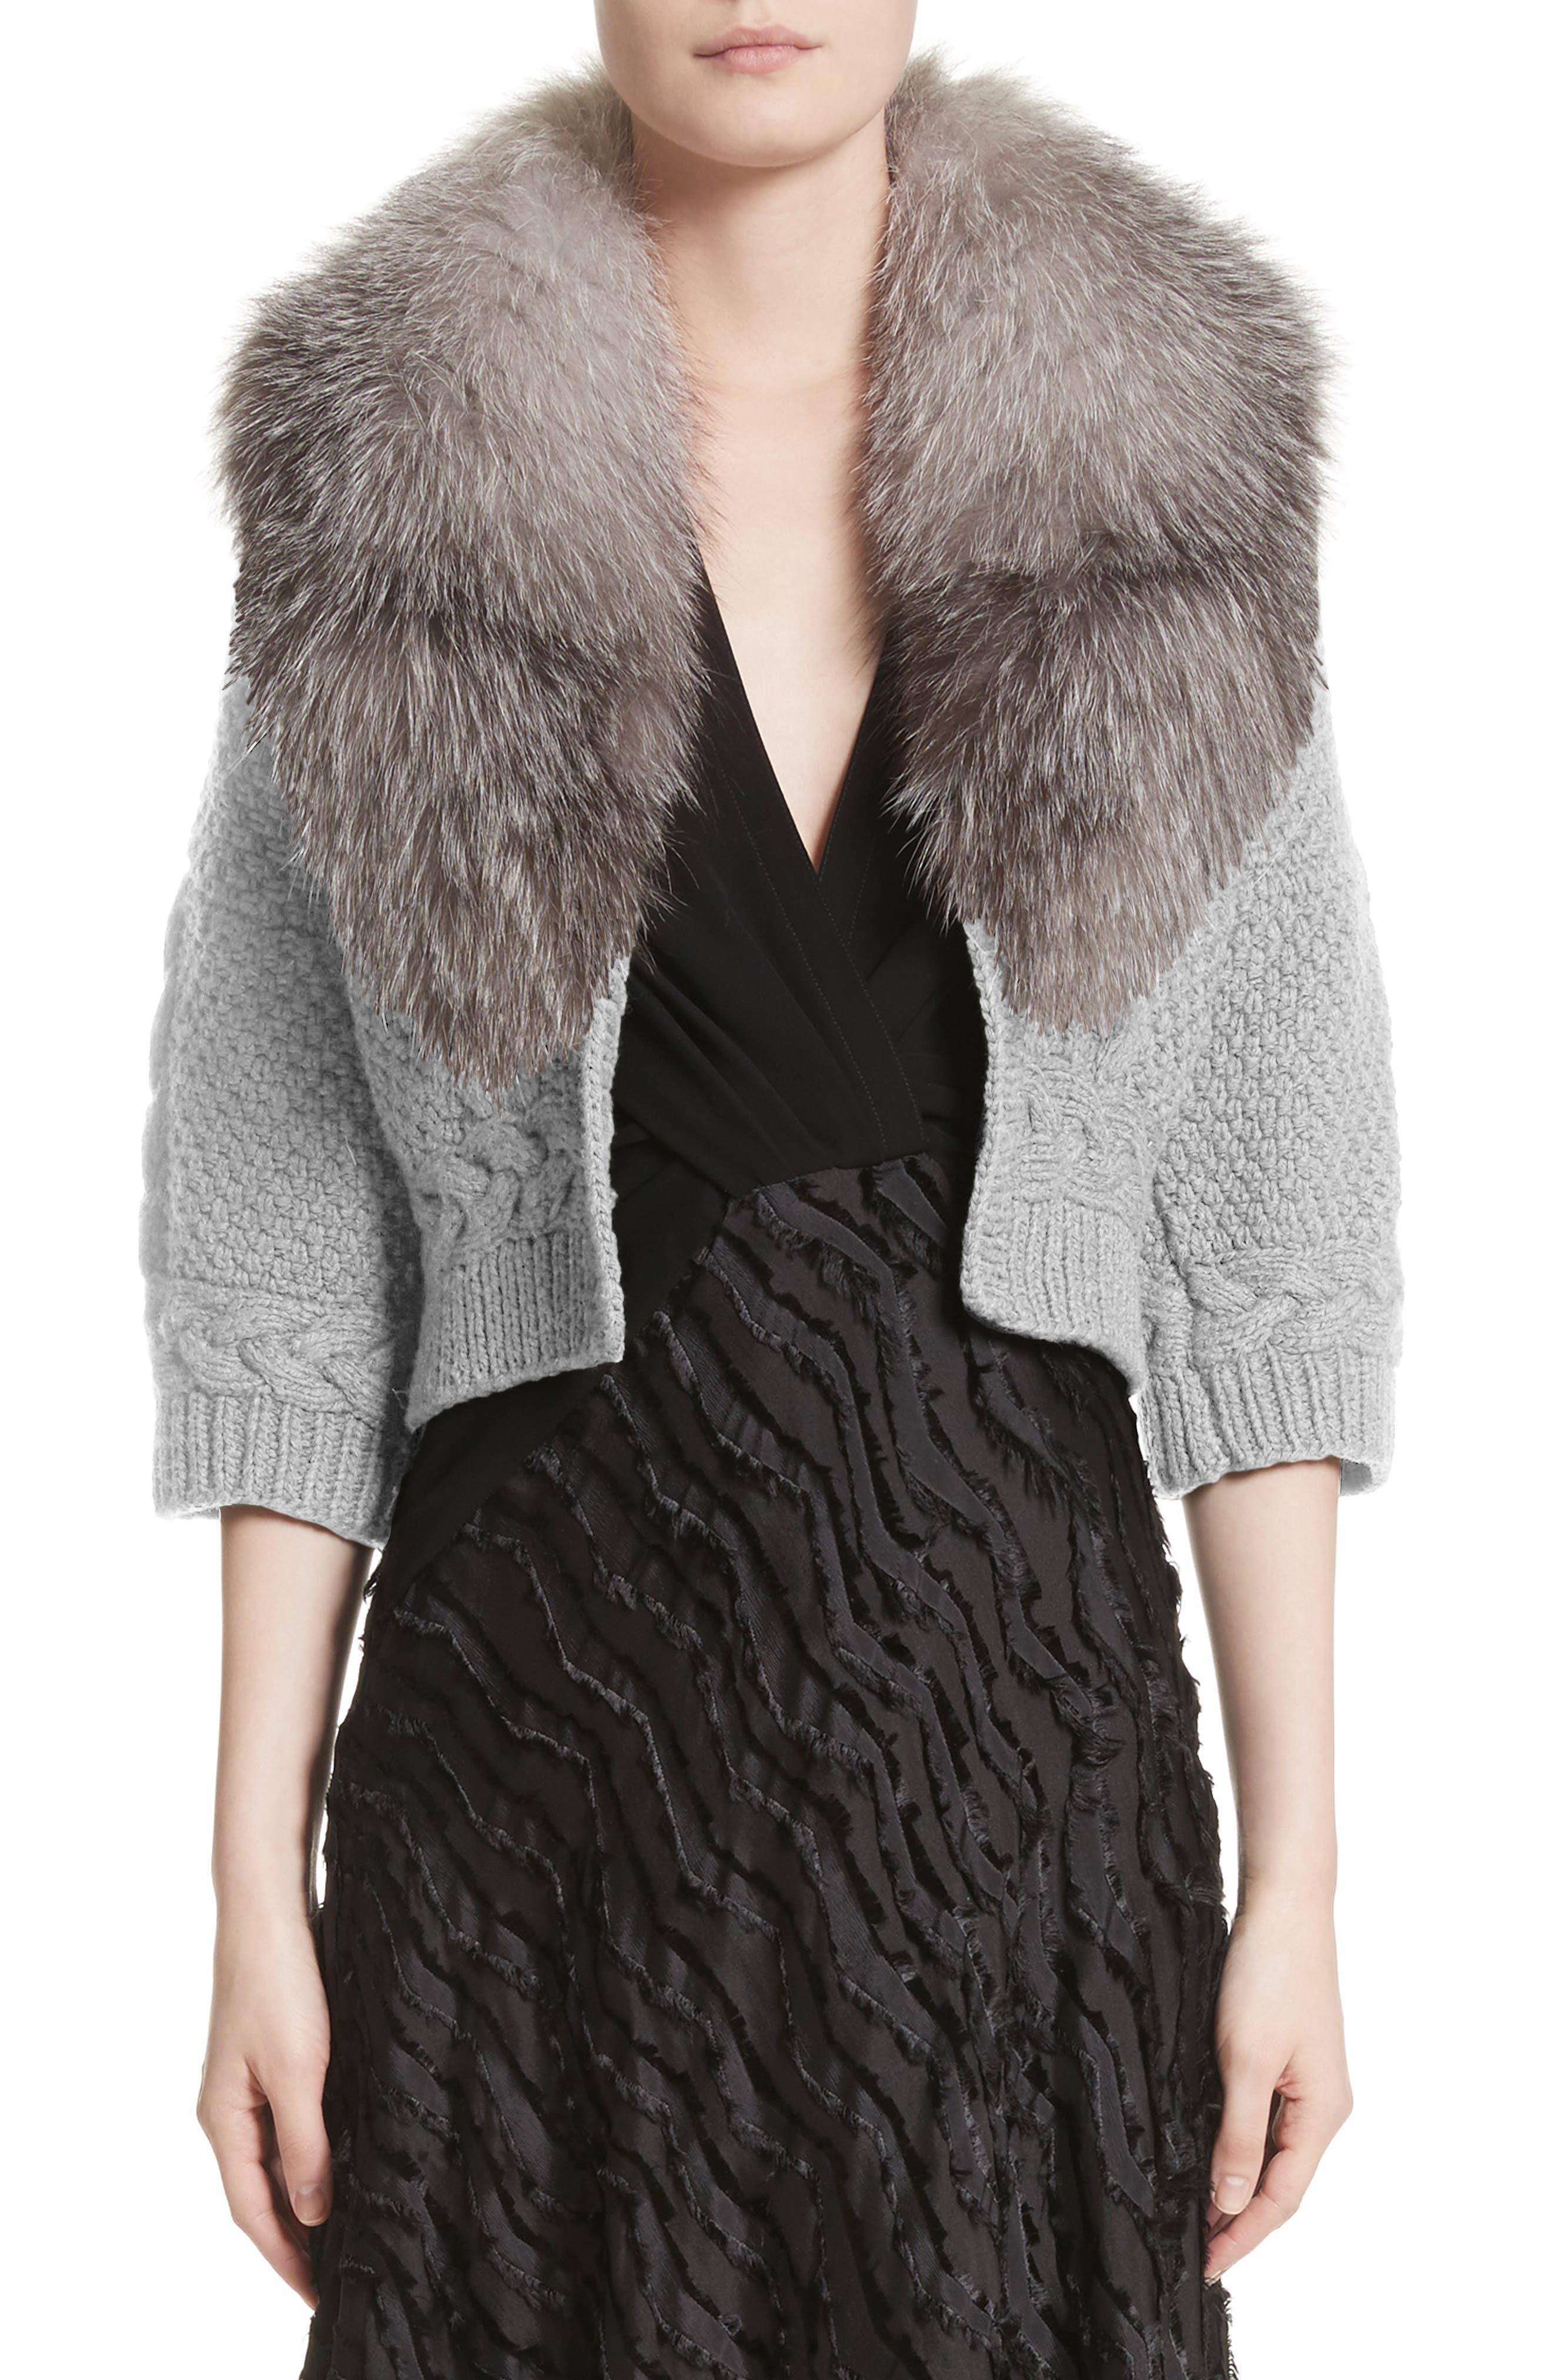 Merino Wool & Cashmere Knit Bolero with Removable Genuine Fox Fur Collar,                         Main,                         color, 087